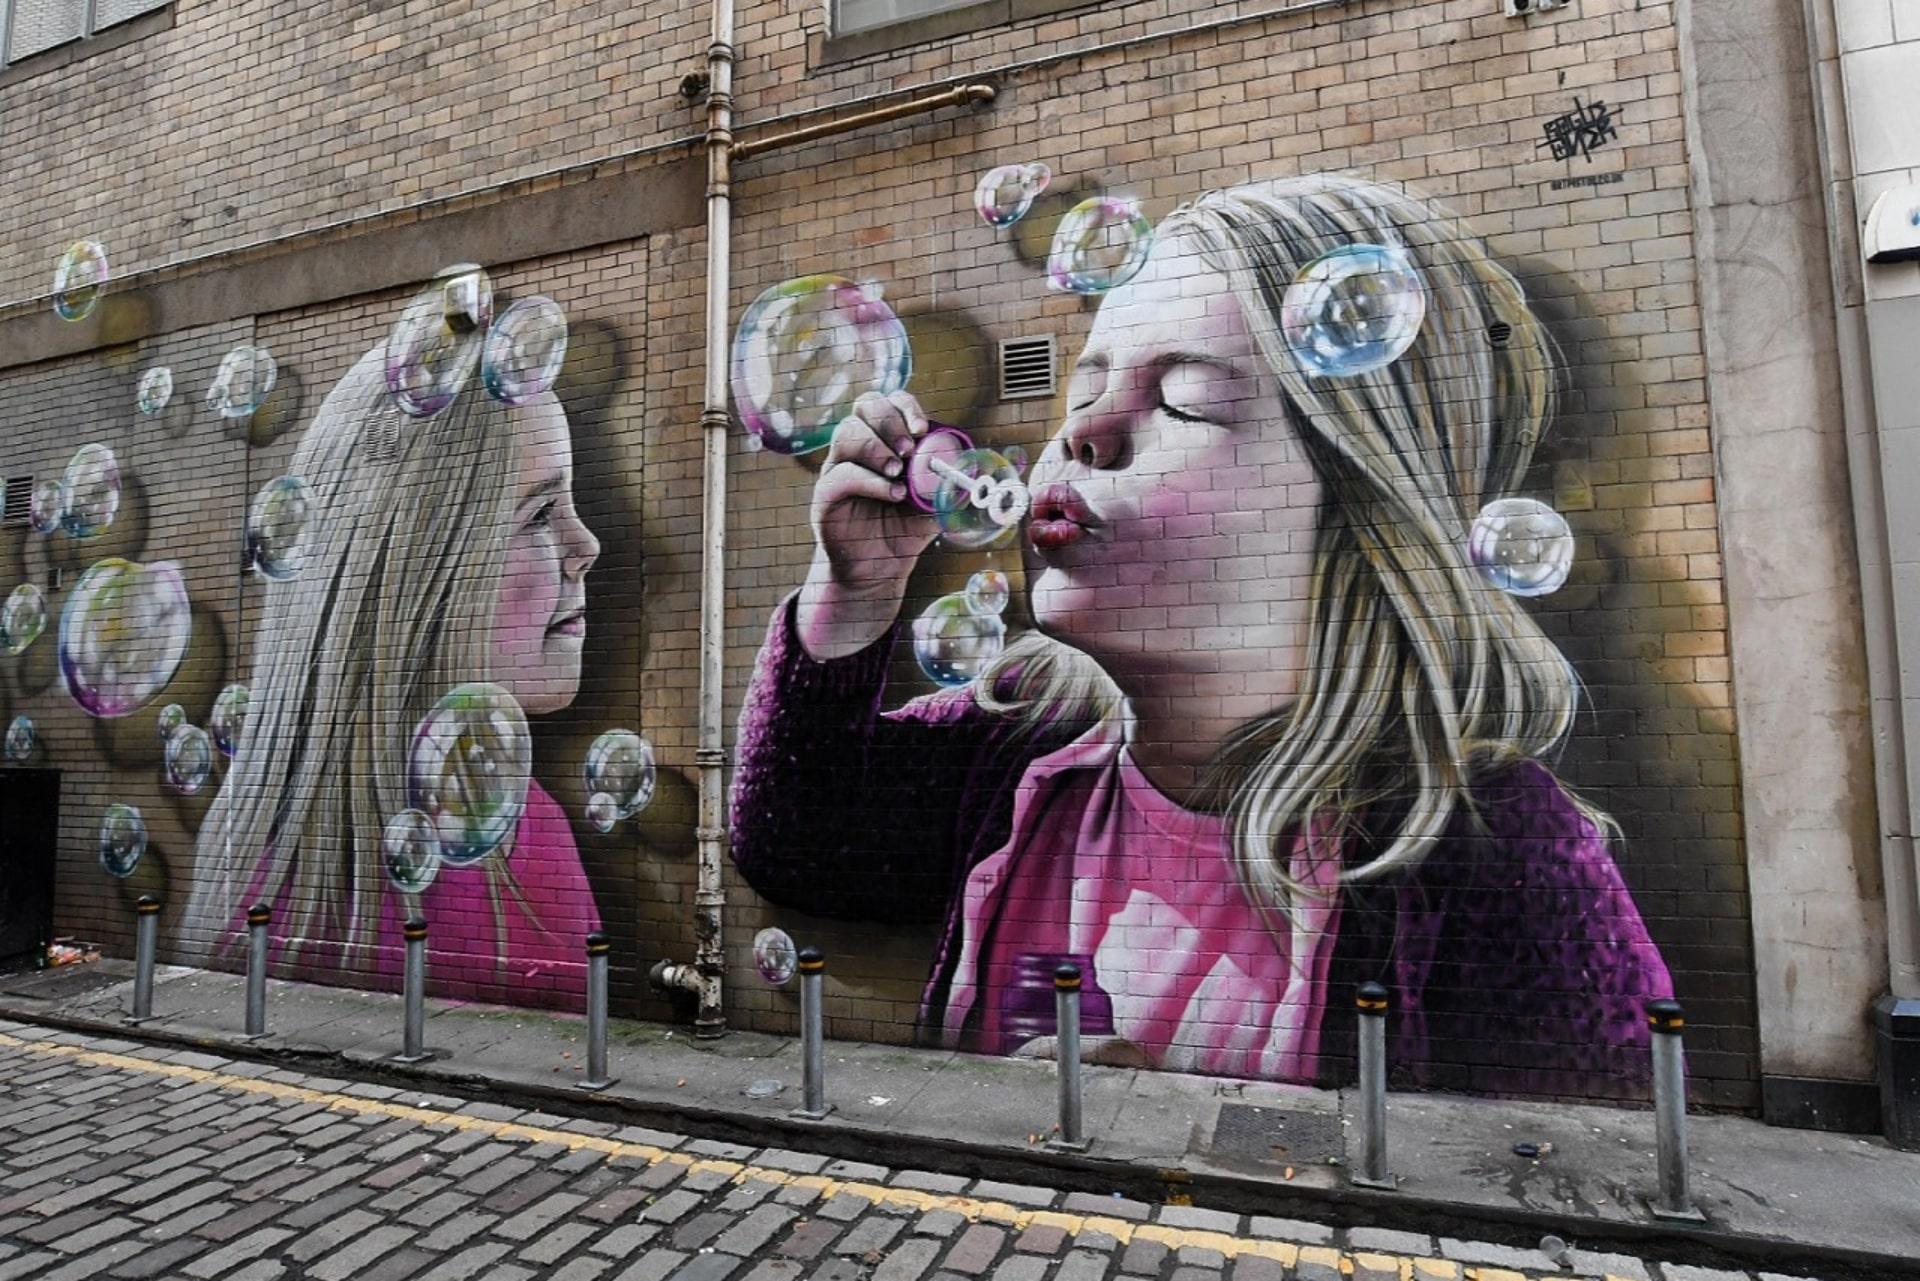 street-art-grafitti-of-a-girl-blowing-bubbles-on-glasgows-mural-trail